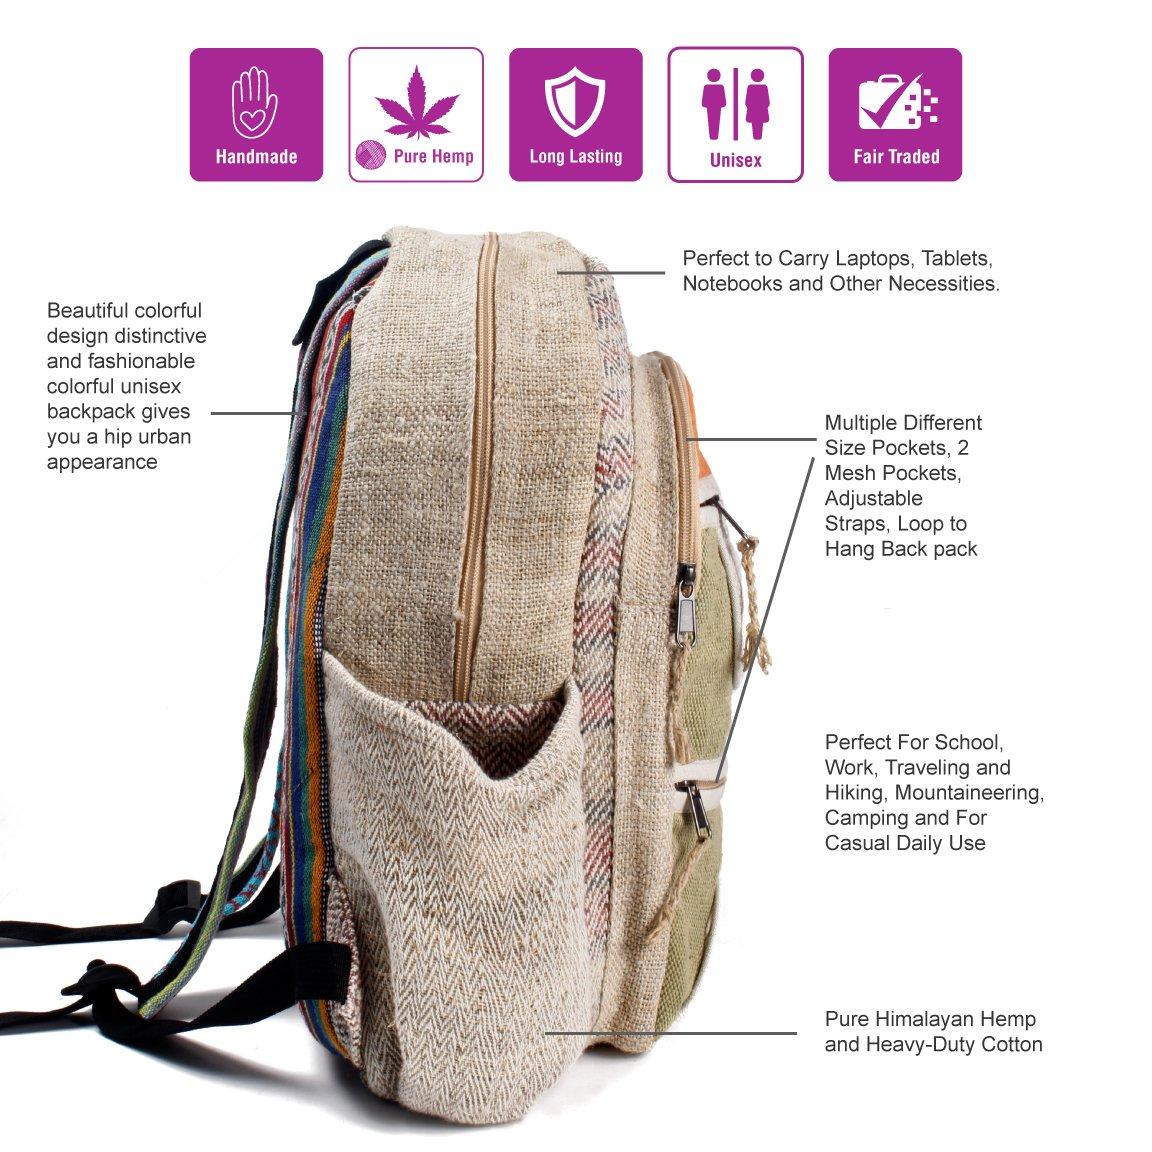 Maha Bodhi All Natural Handmade Multi Pocket Laptop Backpack - Himalayan Hemp by Maha Bodhi (Image #2)